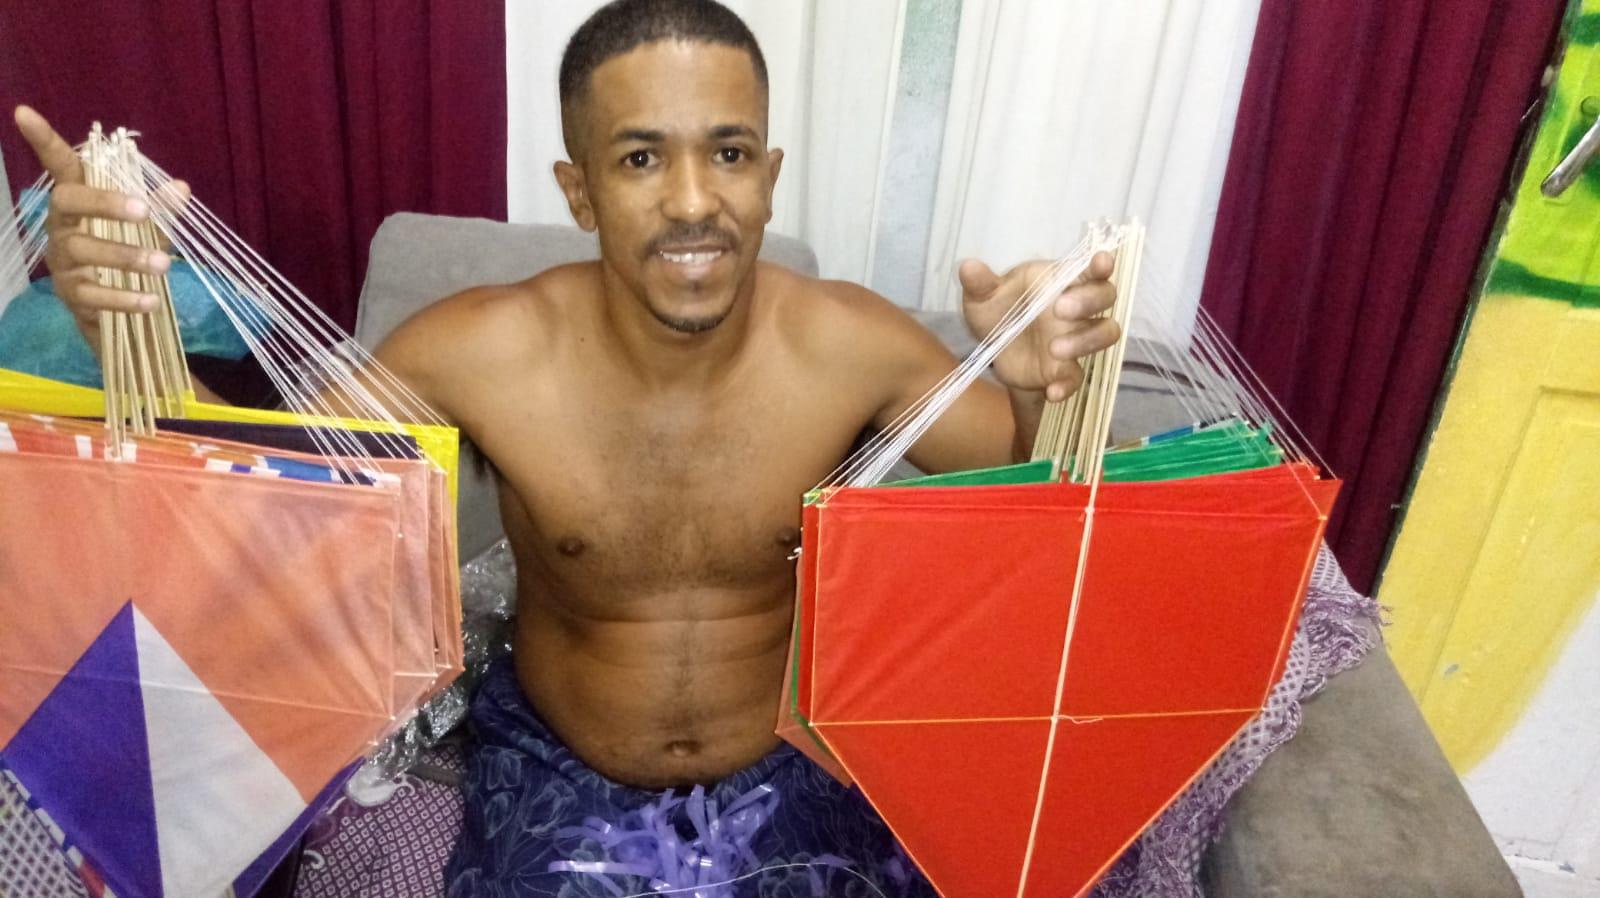 Venda de pipa se torna fonte de renda na favela durante a pandemia